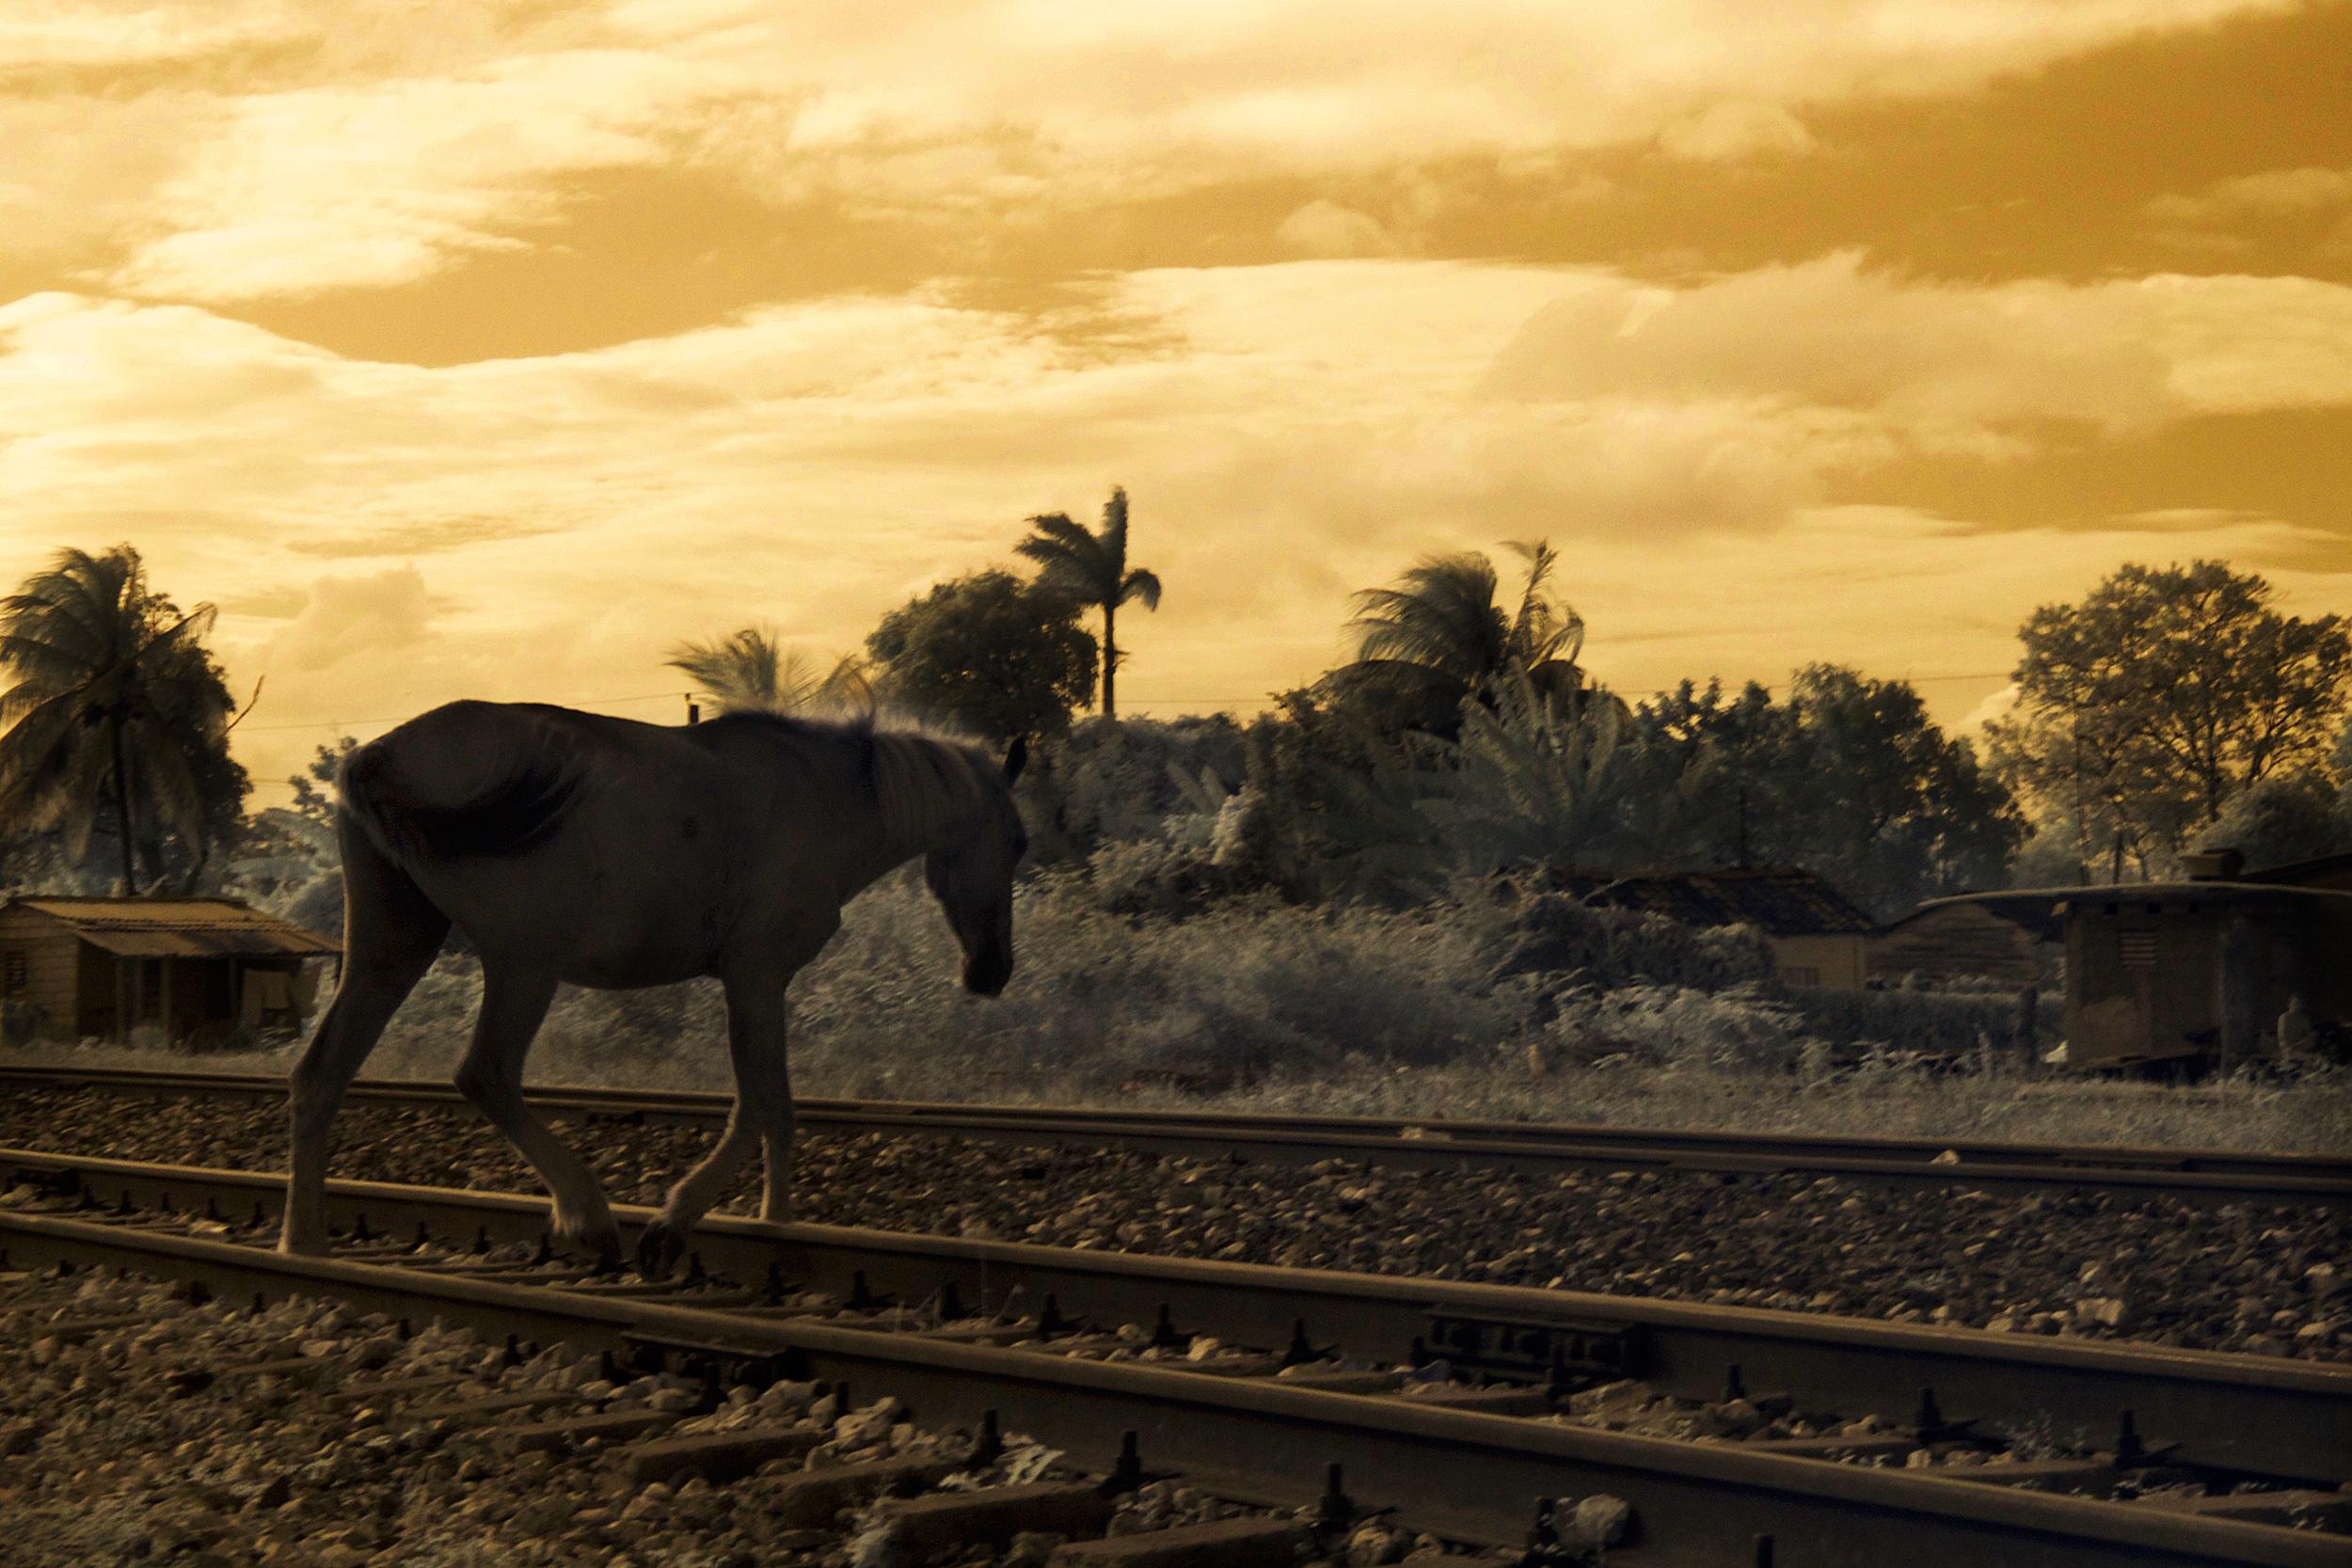 Horse on the railroad tracks